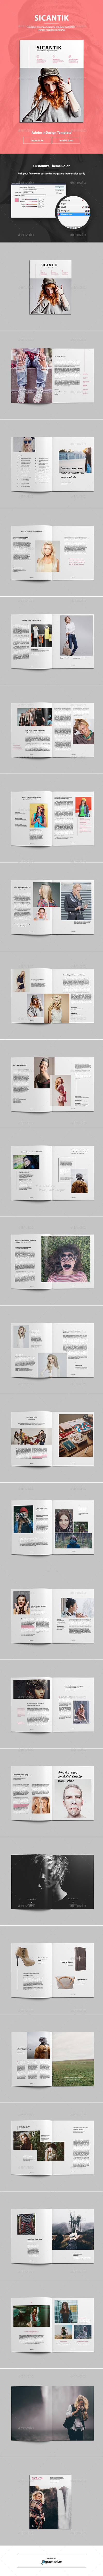 Sicantik Minimal Woman Magazine Template - Magazines Print Templates